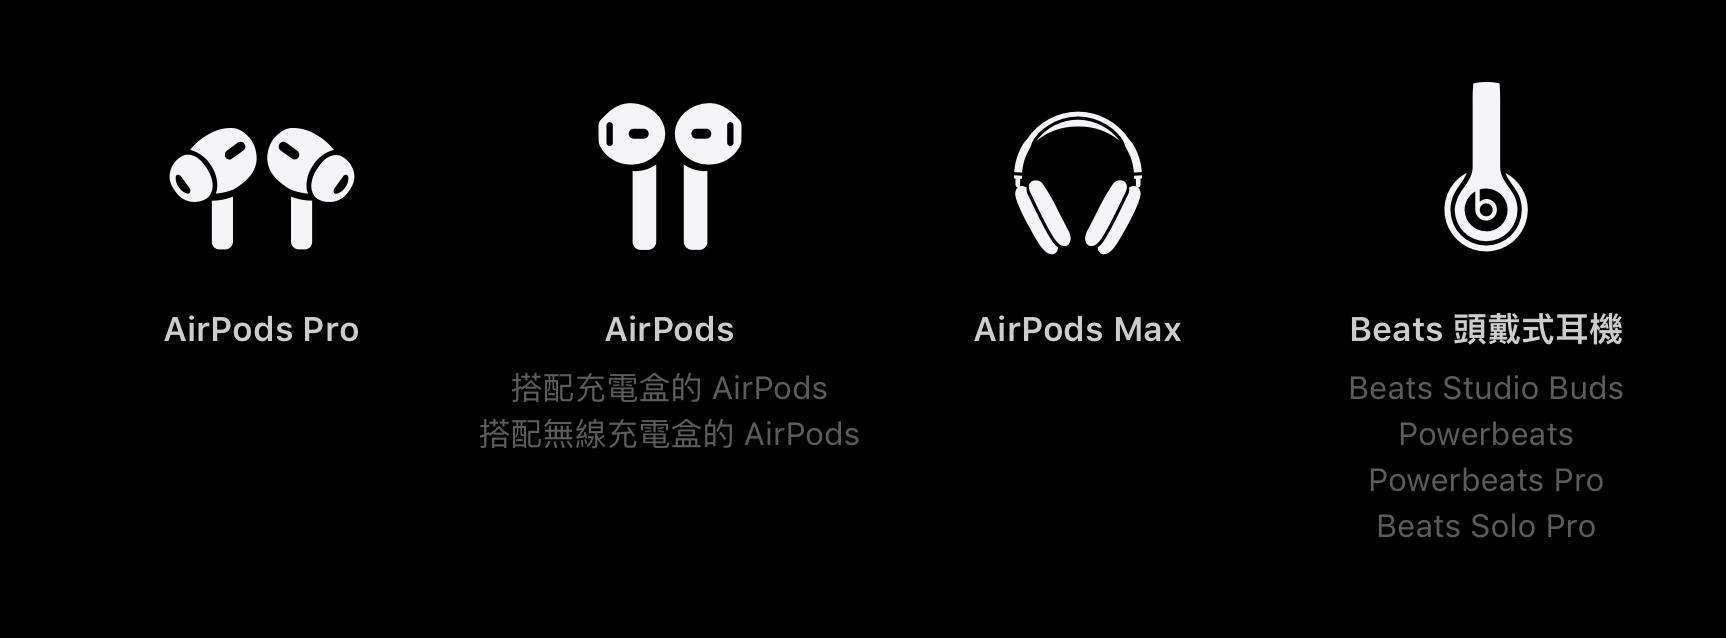 Apple Music 免費聽 6 個月